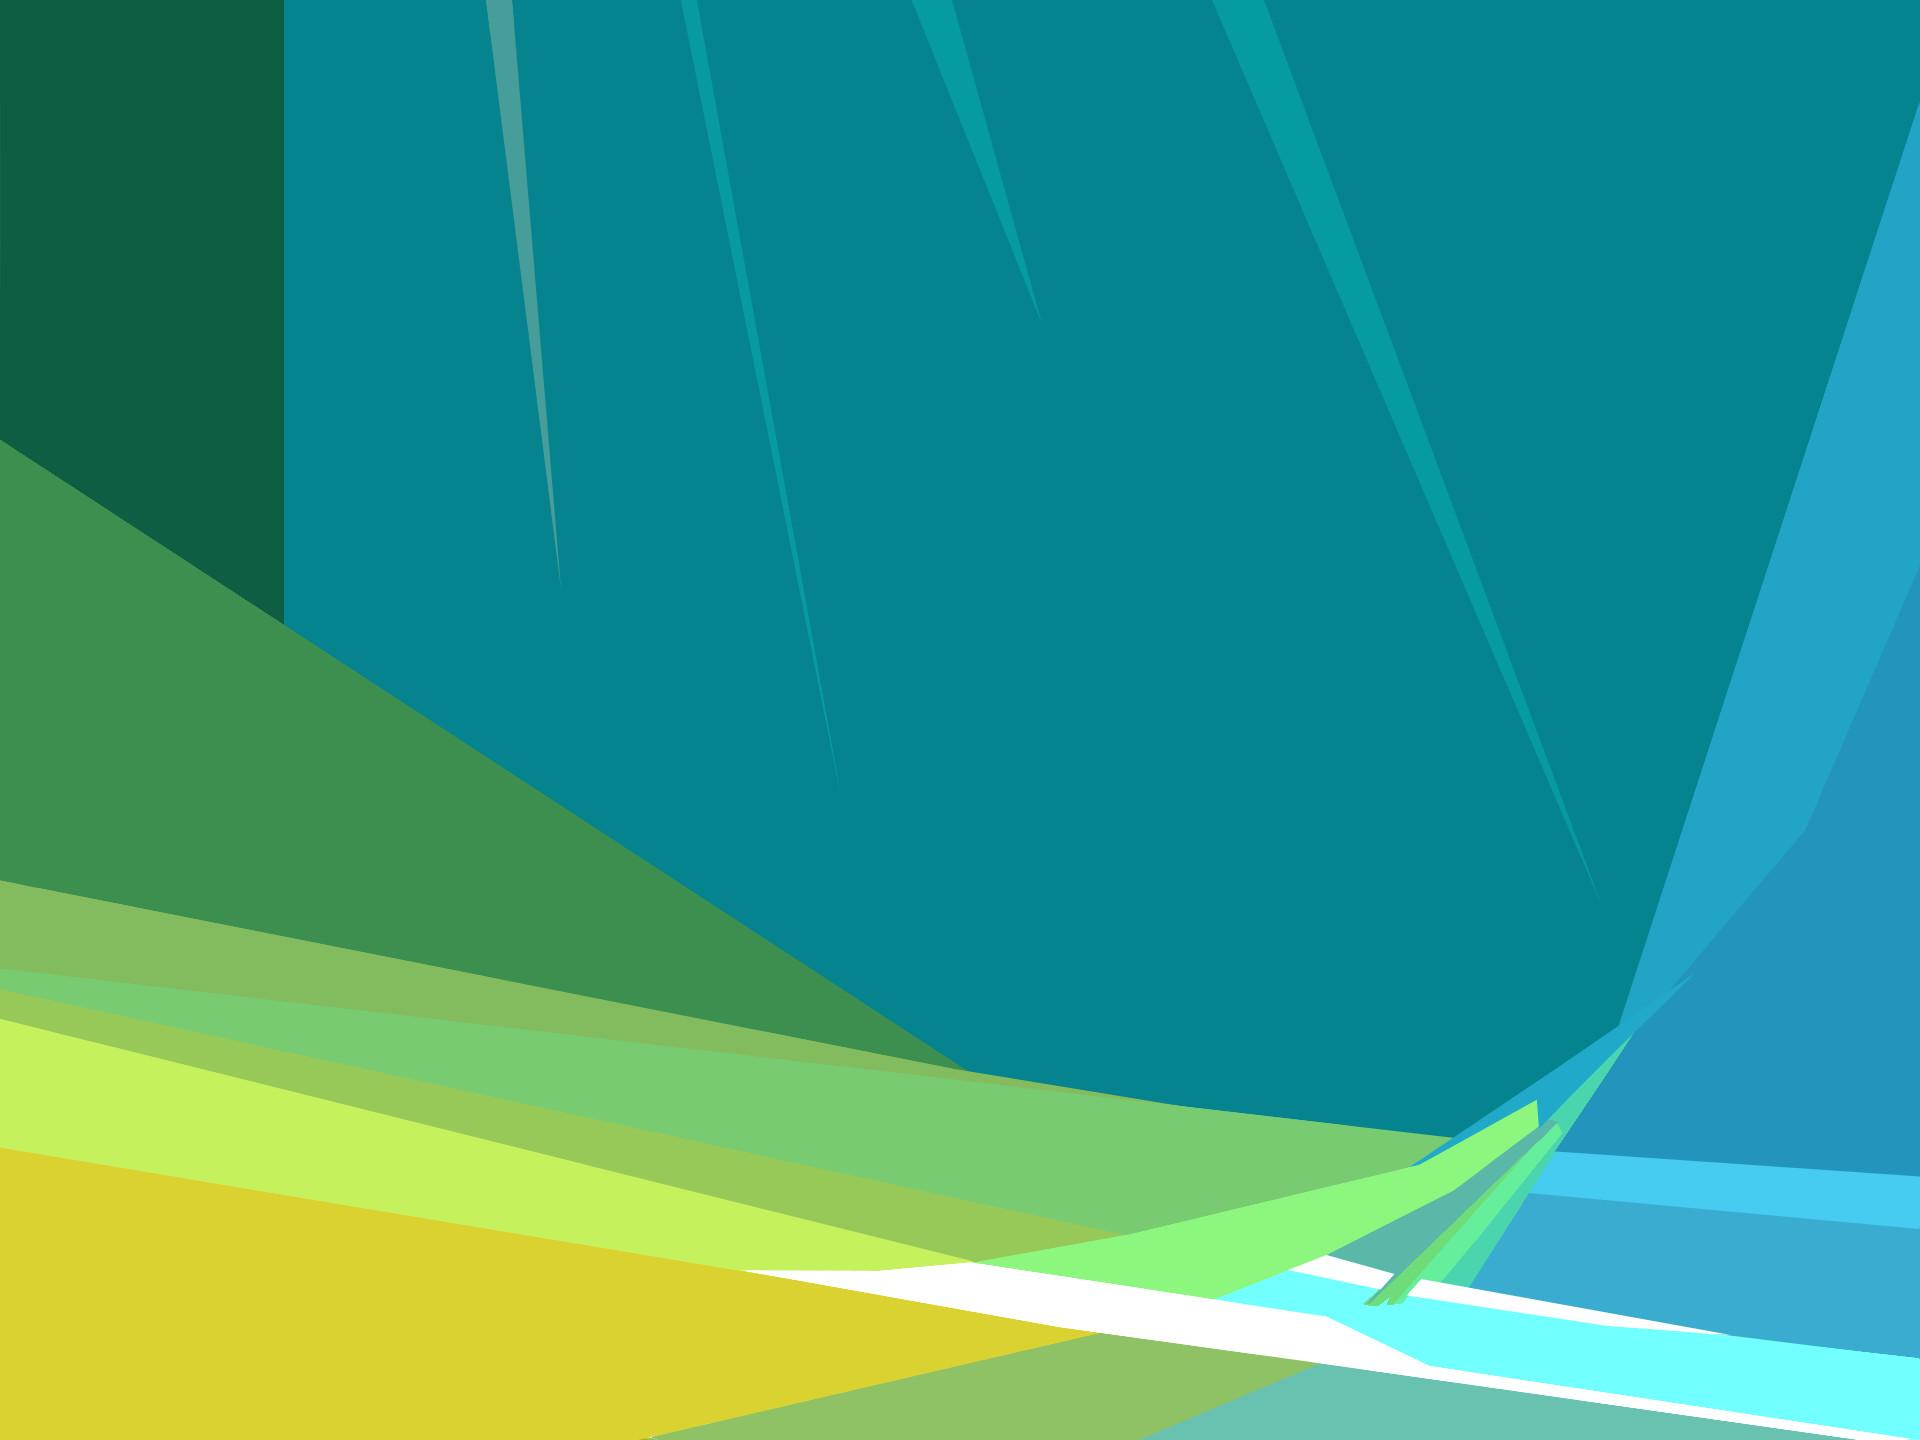 Windows Vista Wallpapers Windows Image By Colbyegumm